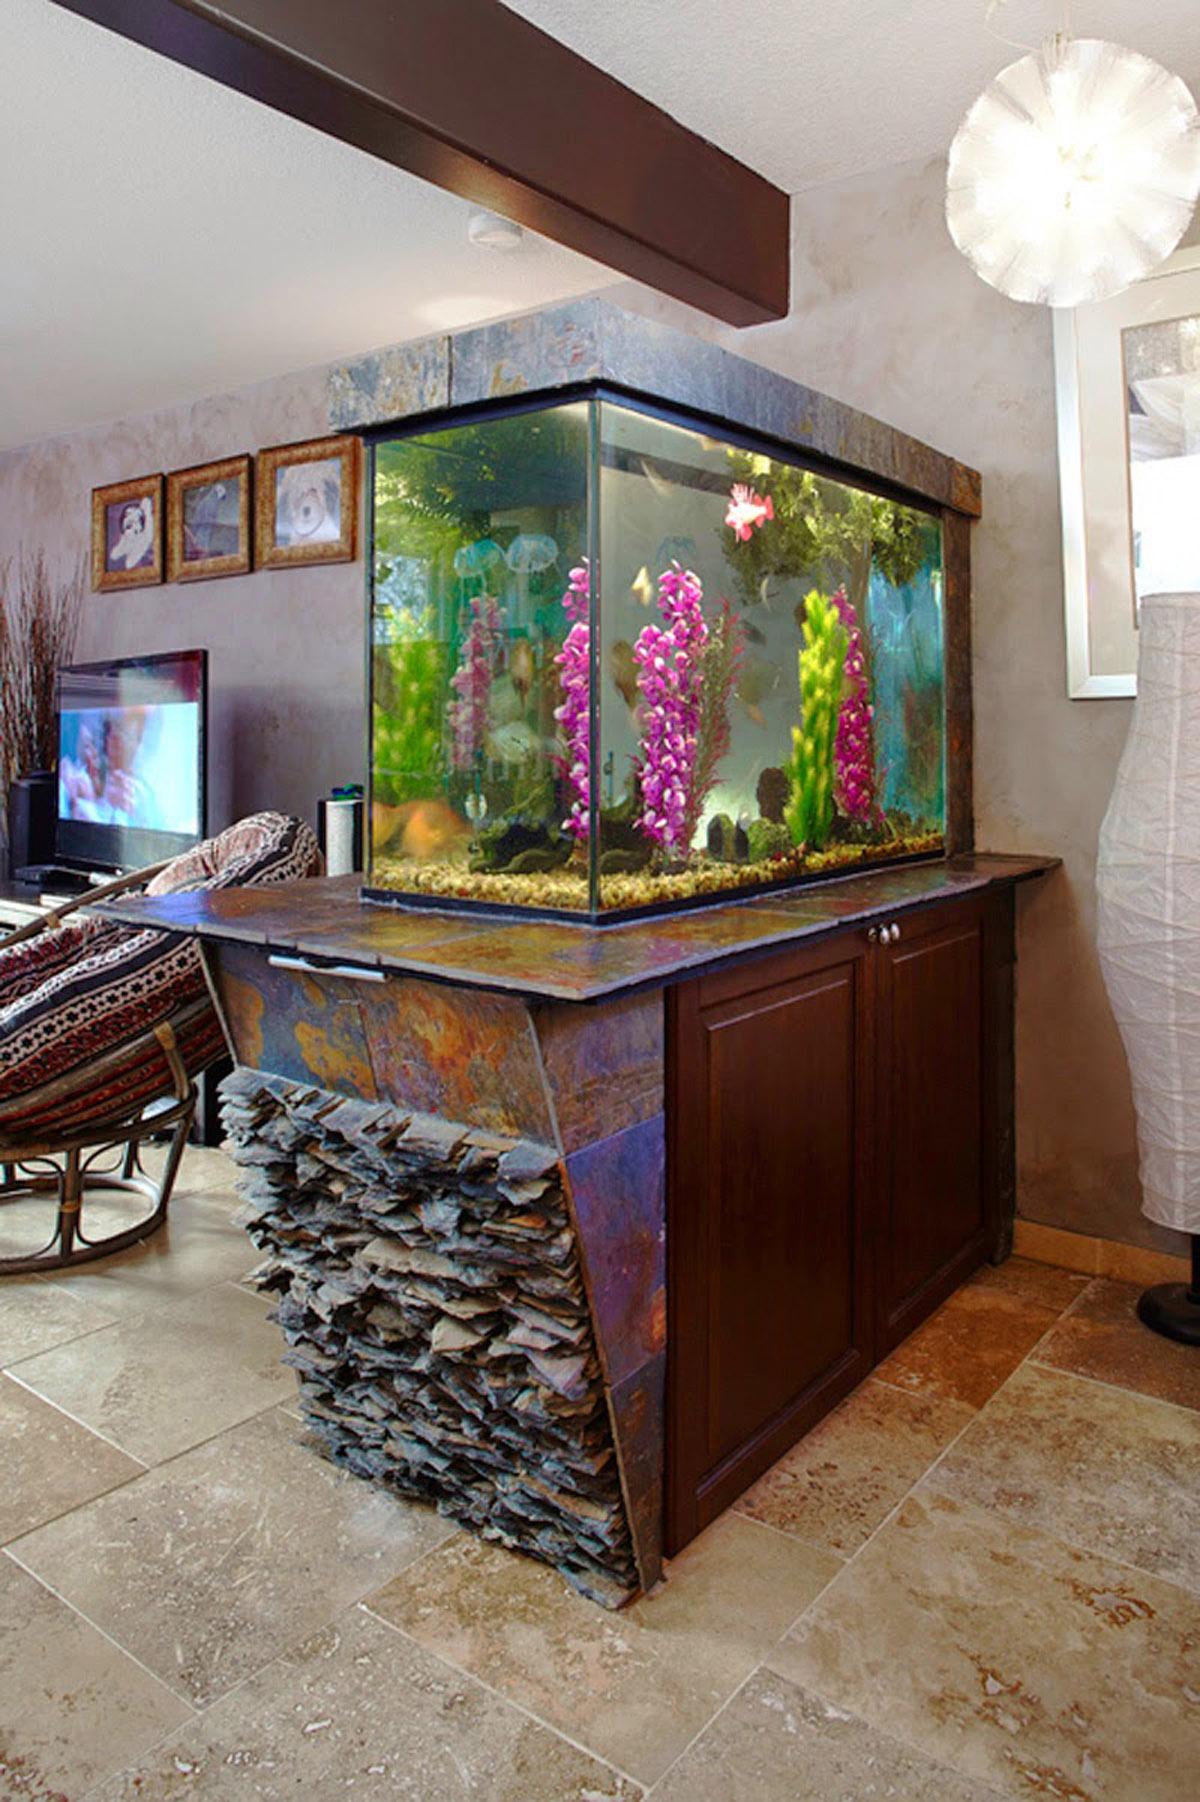 Images Tagged Basement Contractor Calgary 403 560 5186 Sales Wiring Development Custom Aquarium